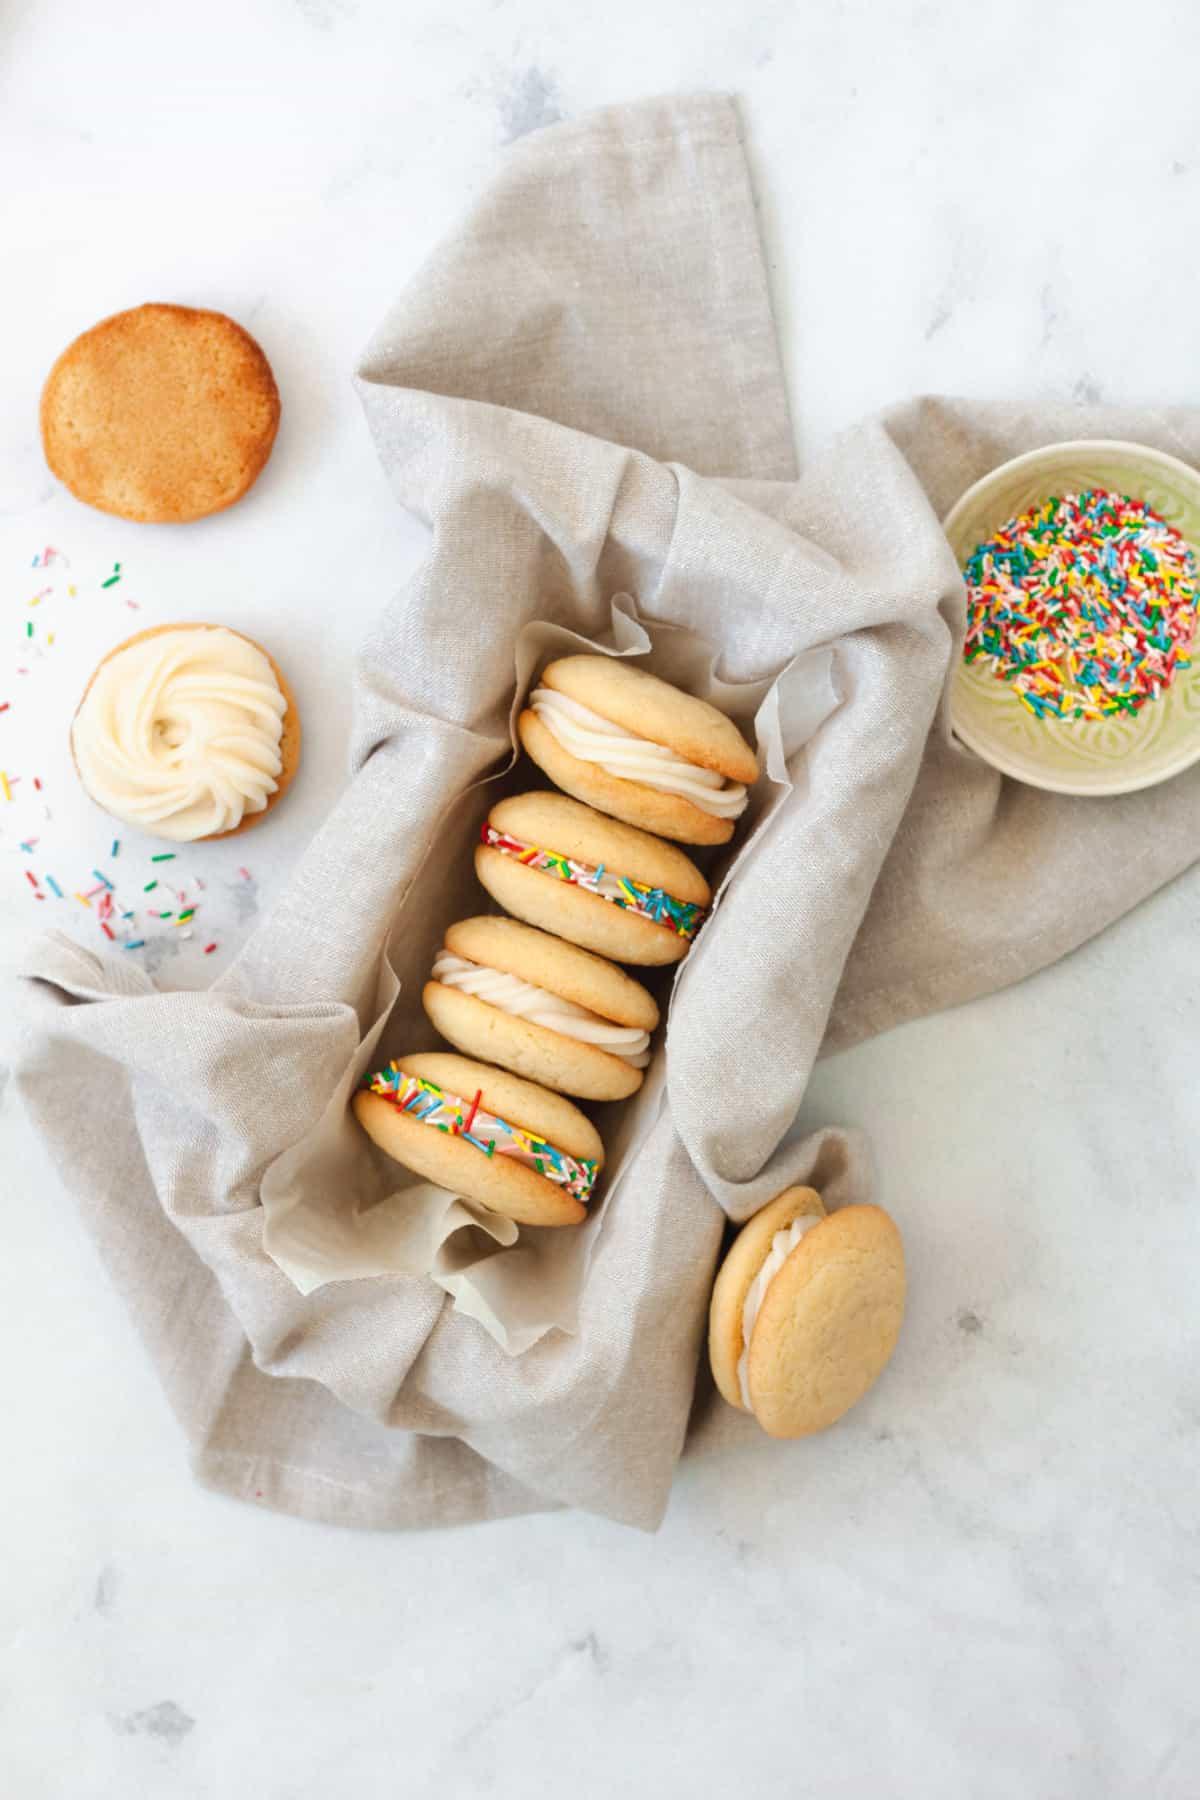 Vanilla Sandwich Cookies with Mascarpone Filling